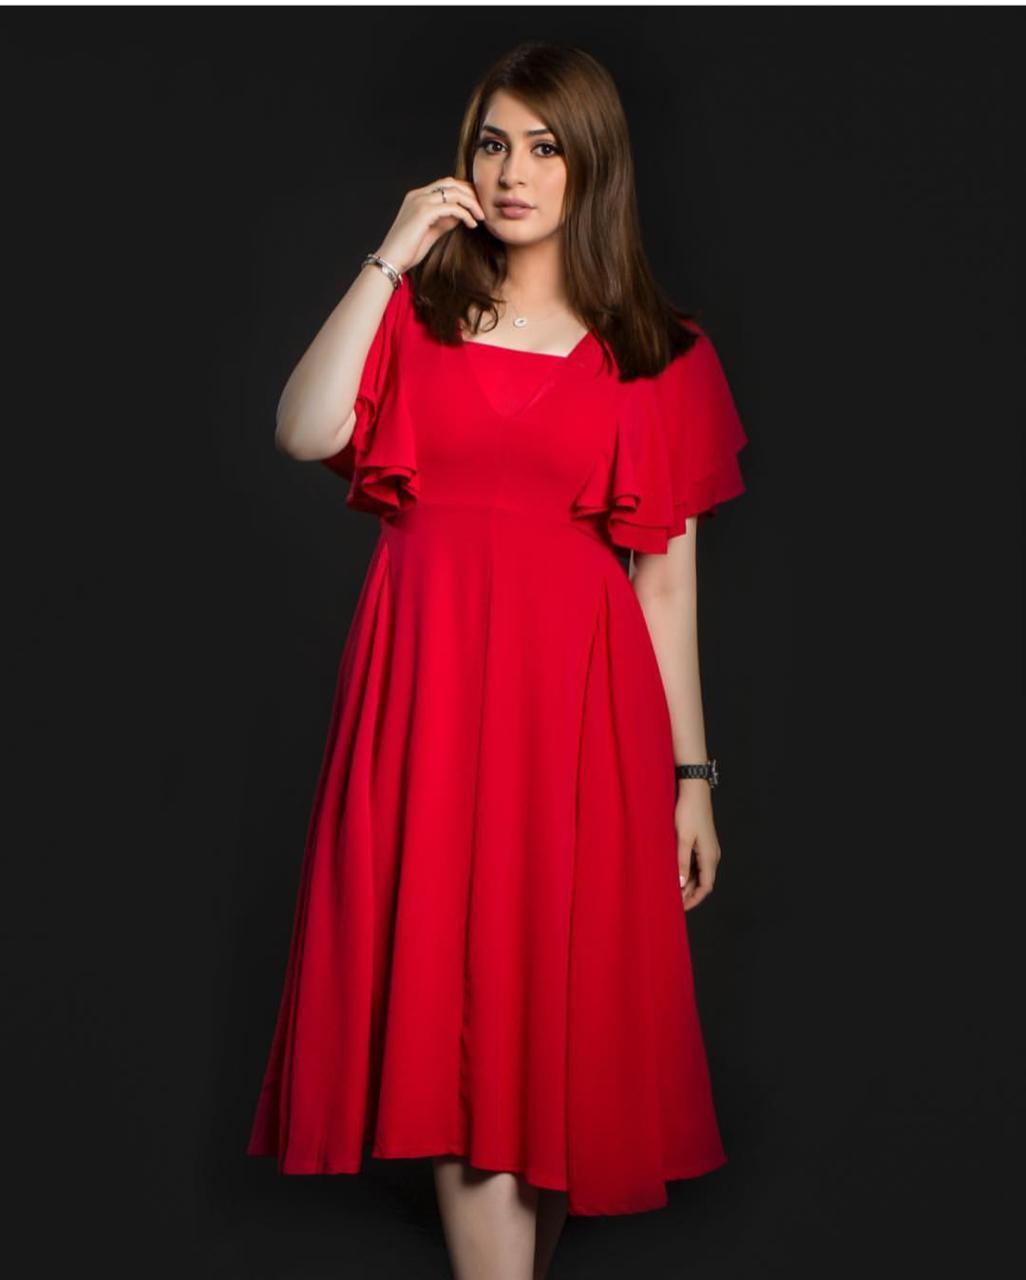 فستان صيفي باللون الأحمر